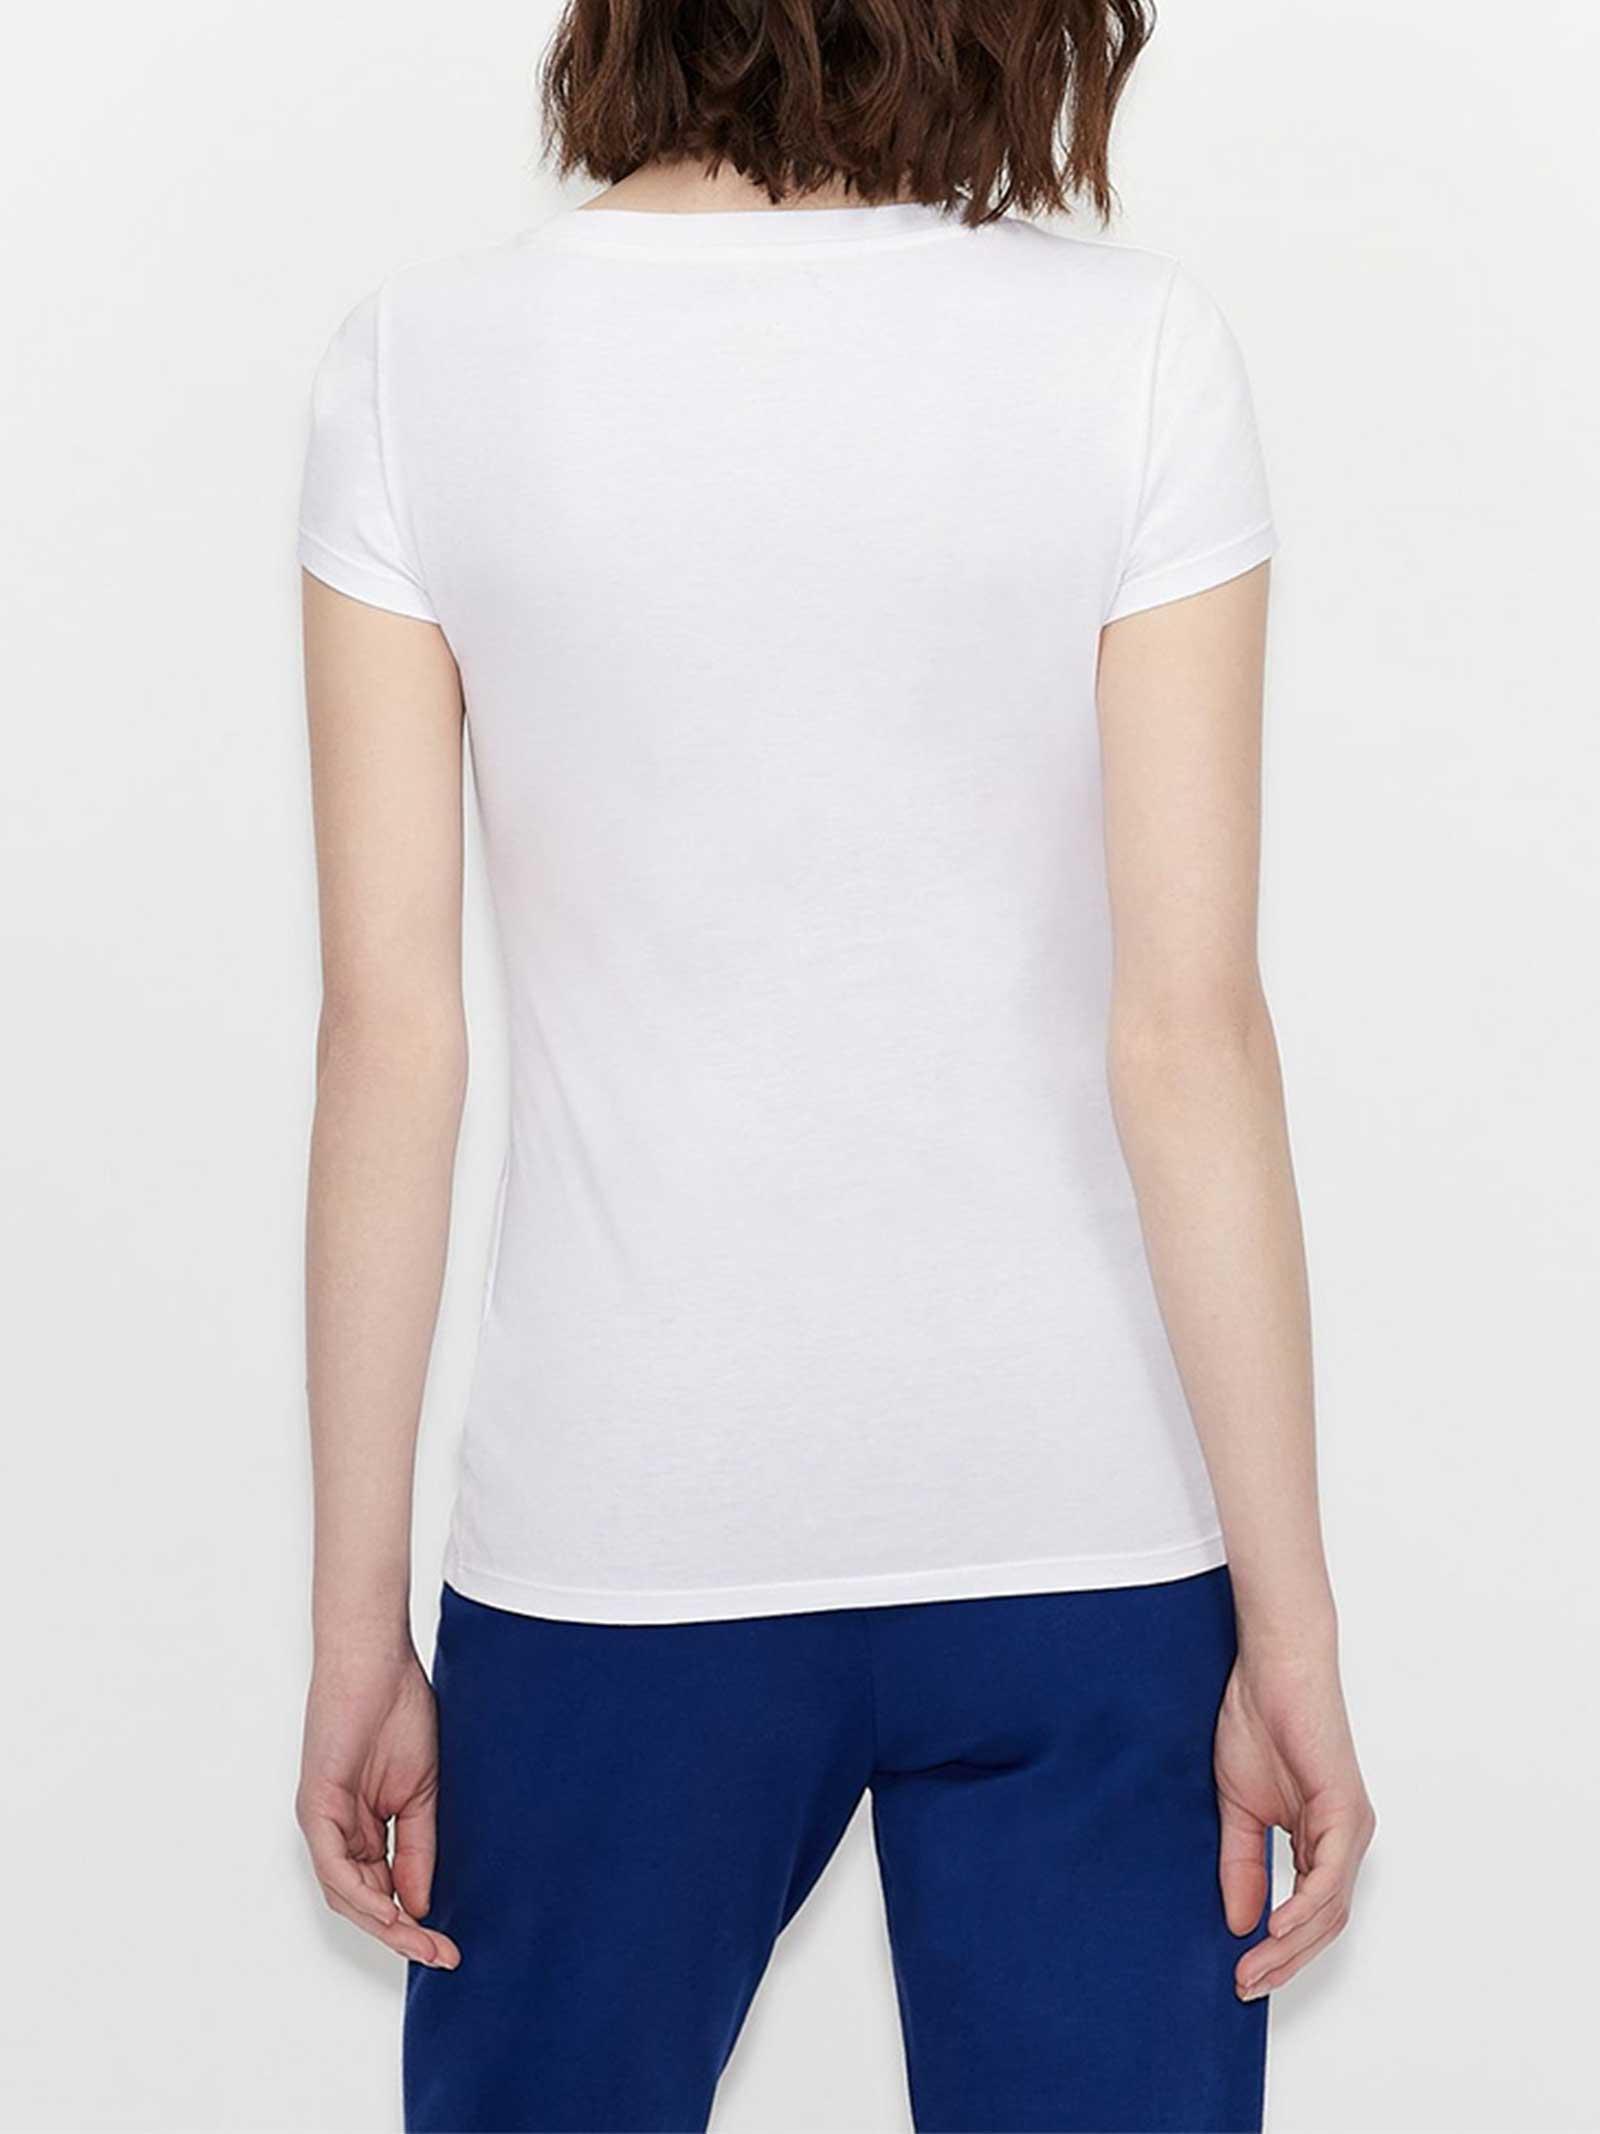 T-SHIRT DONNA ARMANI EXCHANGE   T-shirt   3KYTGU-YJW1Z1000